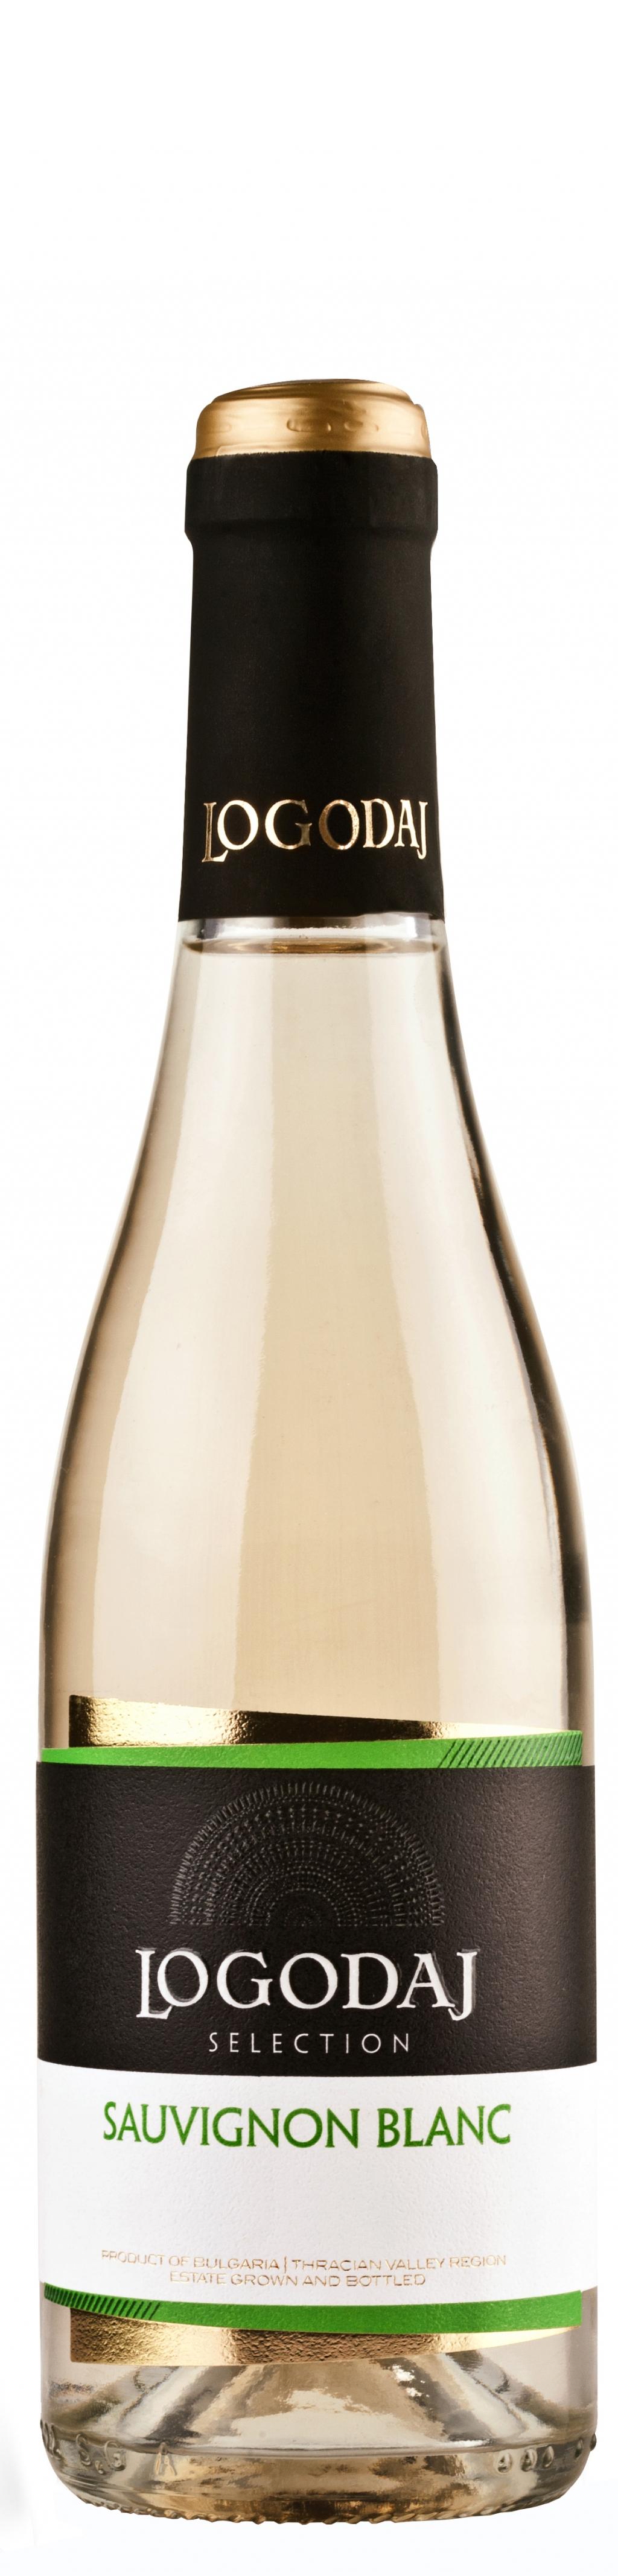 Бяло Вино Логодаж Селекшън Совиньон Блан 0.375 л